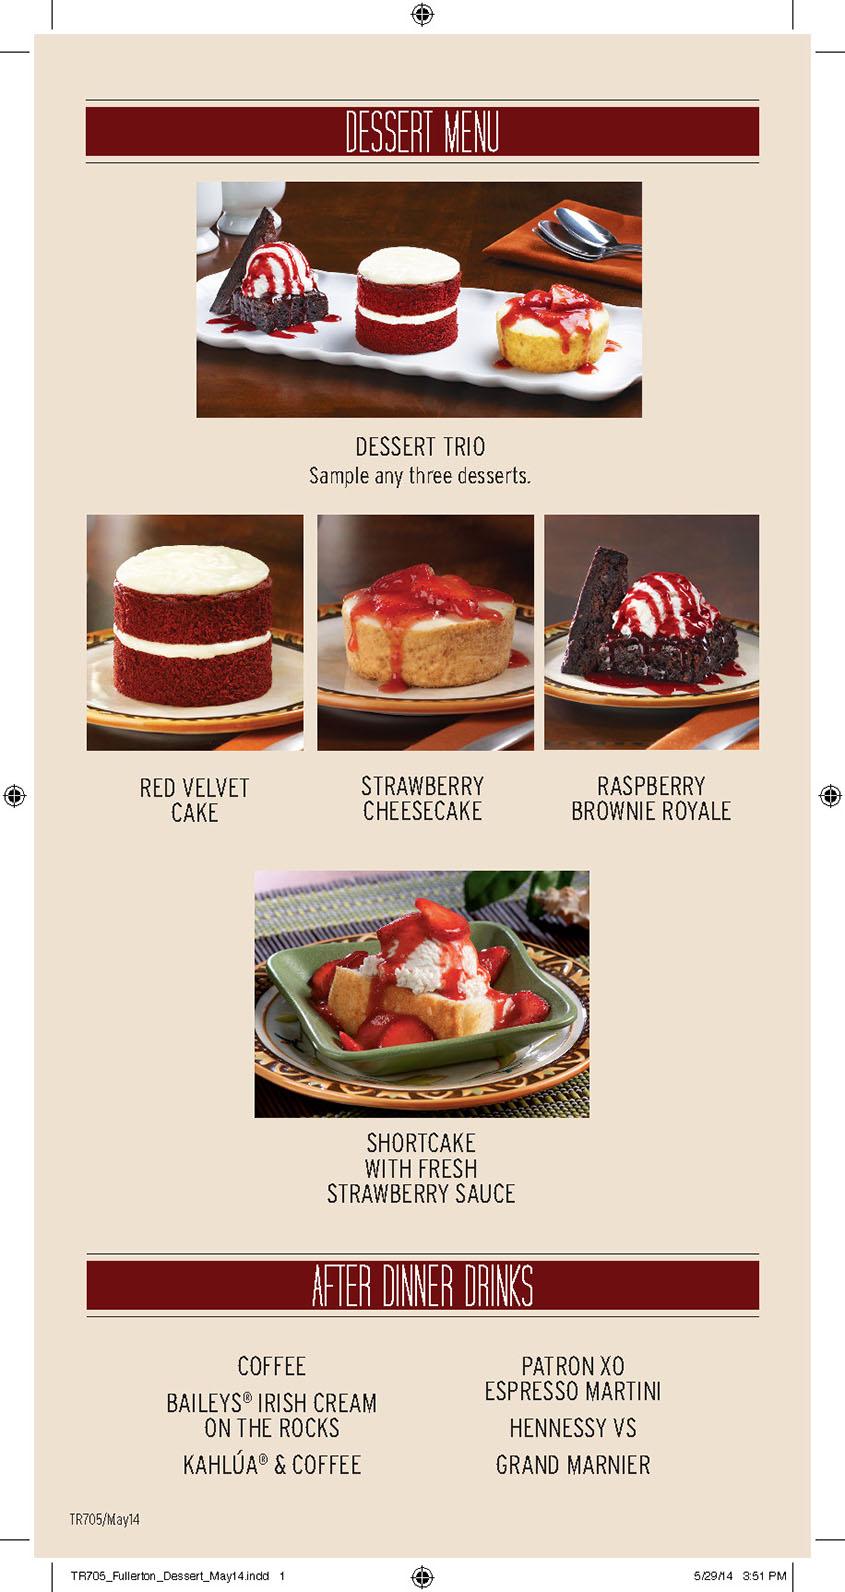 xTR705_Fullerton_Dessert_May14